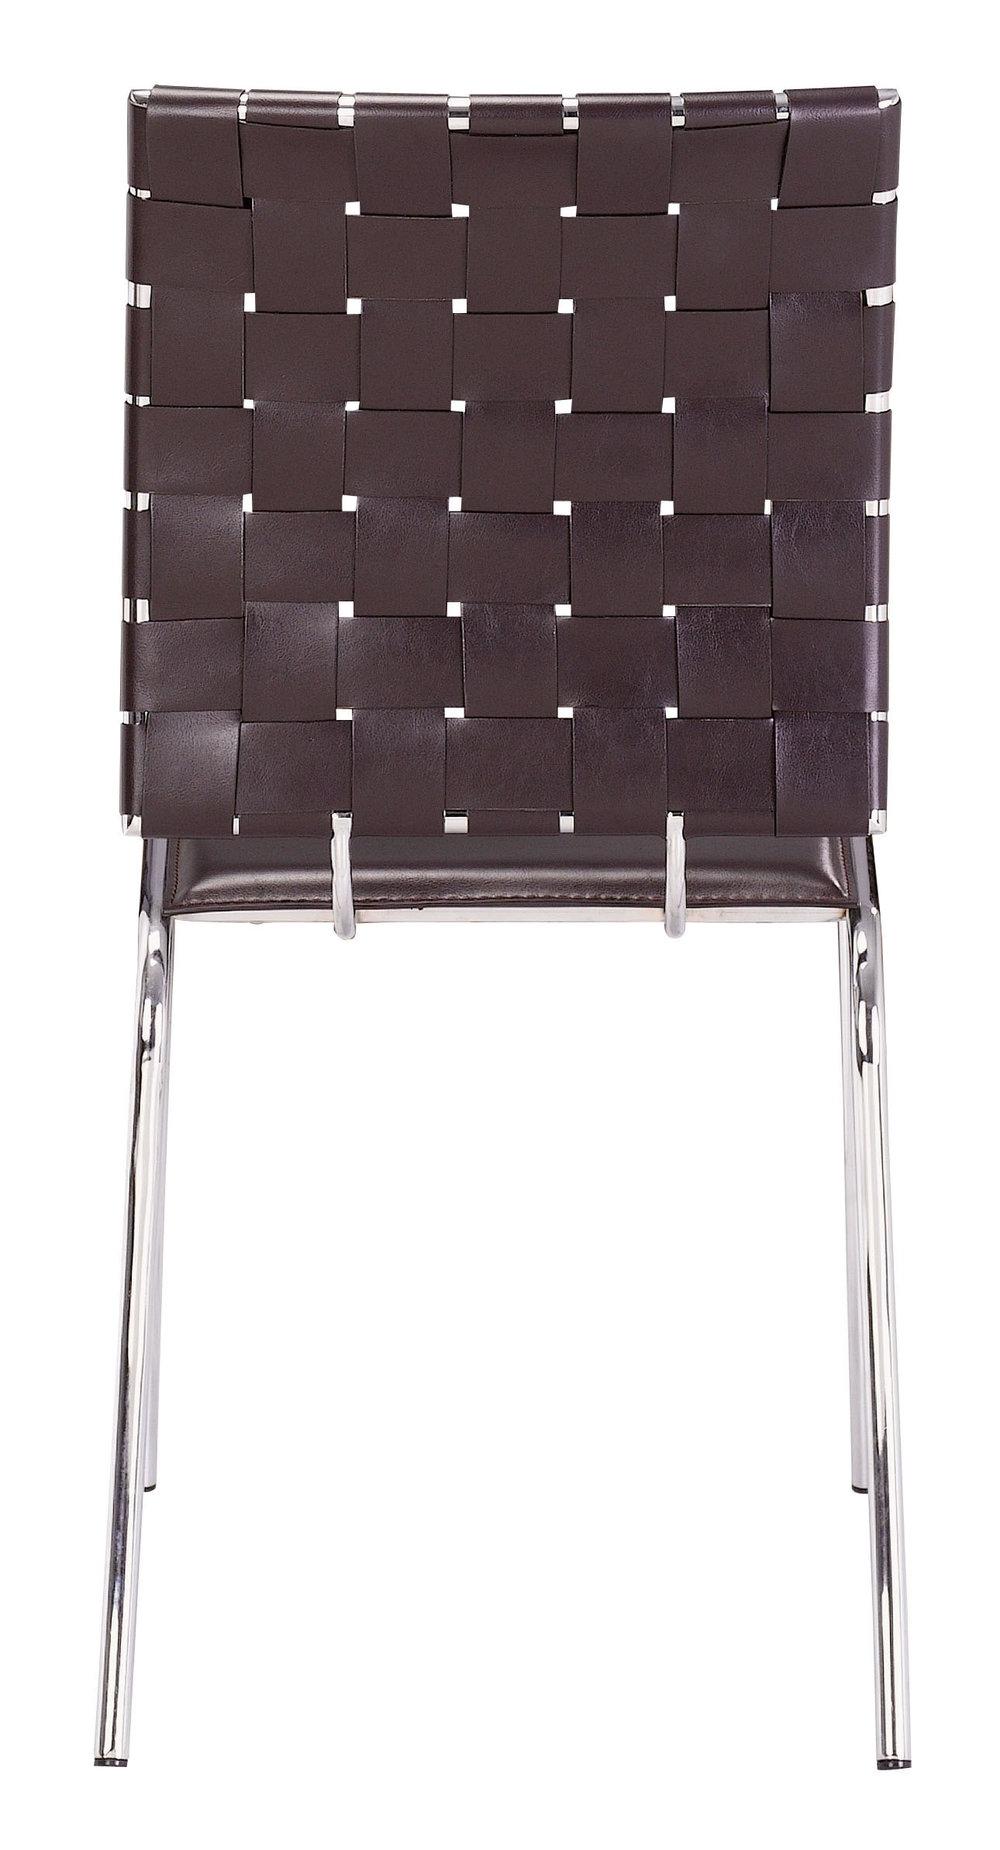 Zuo Modern Contemporary - Criss Cross Dining Chair - Set of 4 - Espresso